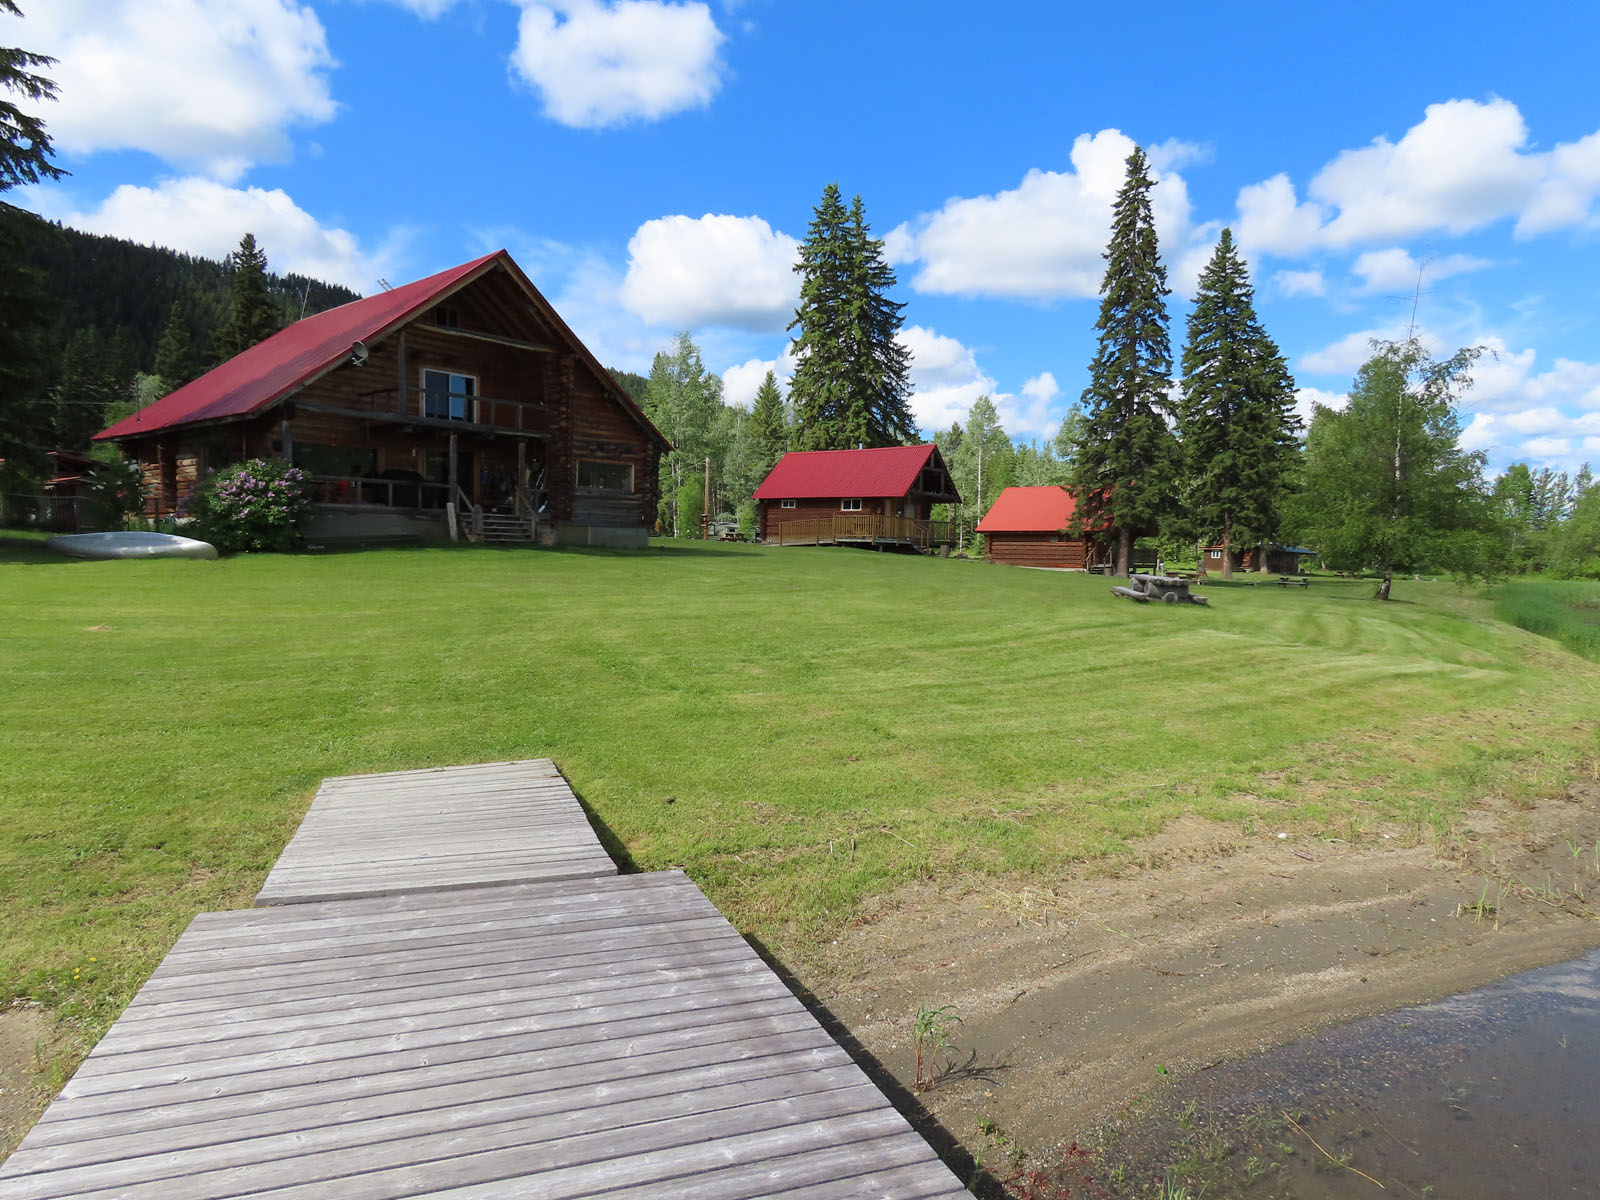 Canim lake resort 20